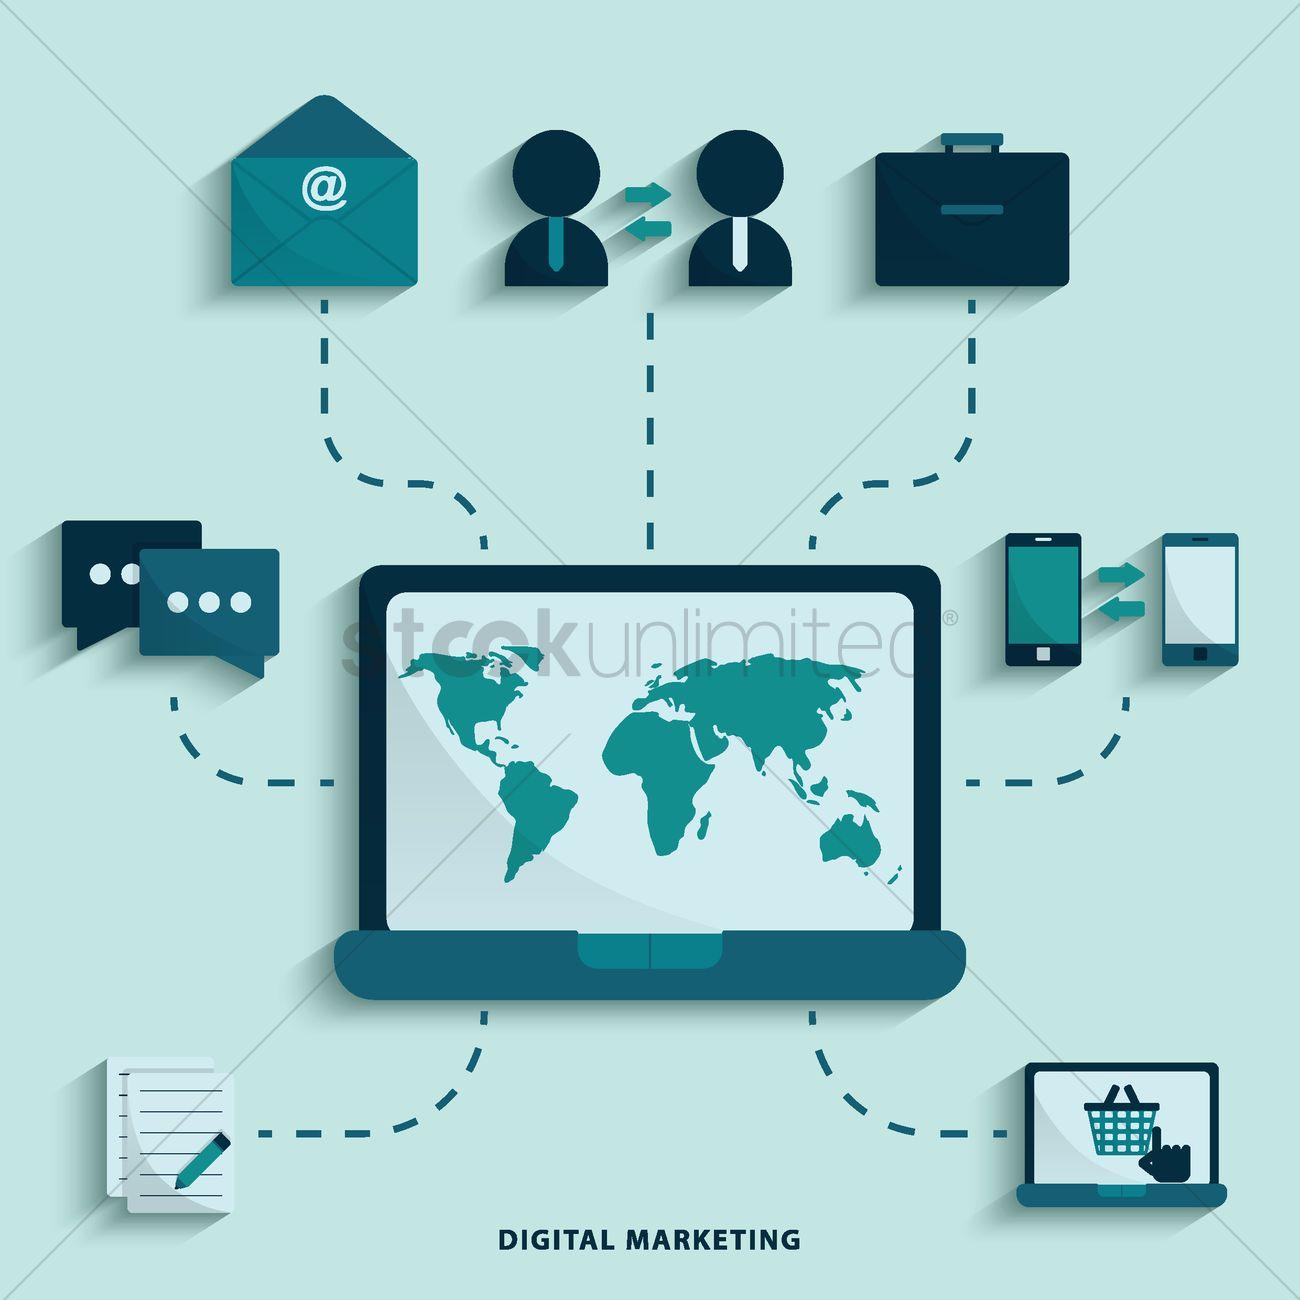 digital marketing vector image 1517540 stockunlimited digital marketing vector image